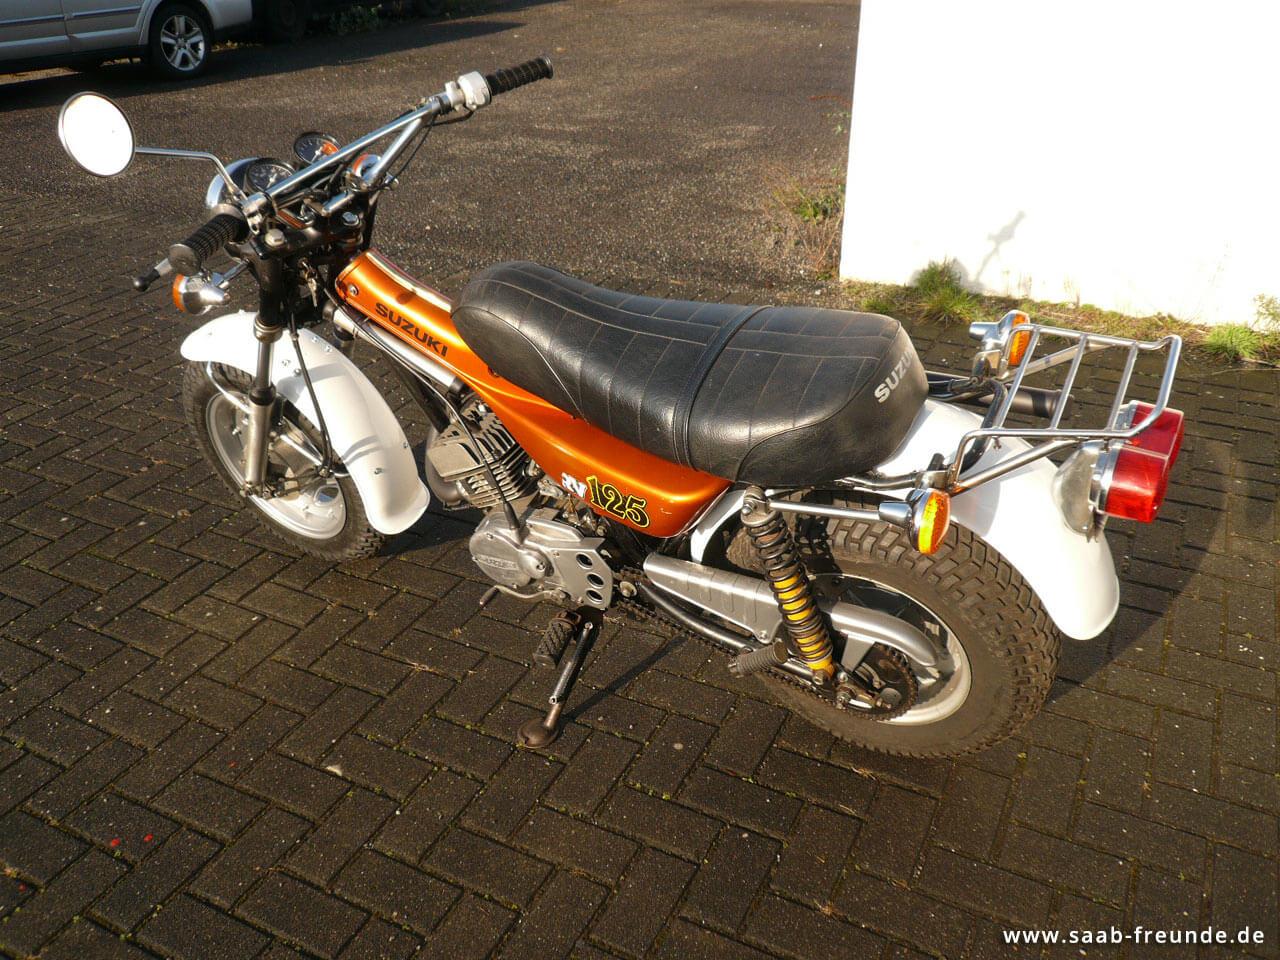 SUZUKI RV 125 Funbike (8)